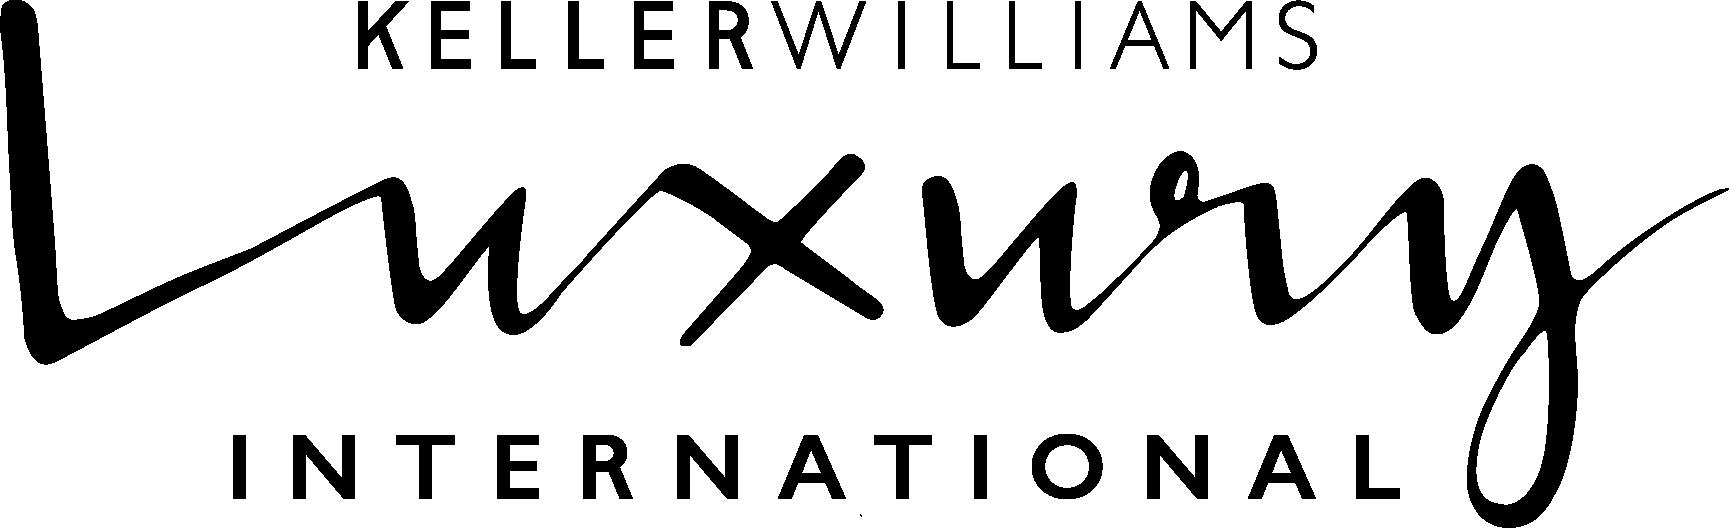 Kw luxuryinternational logo black